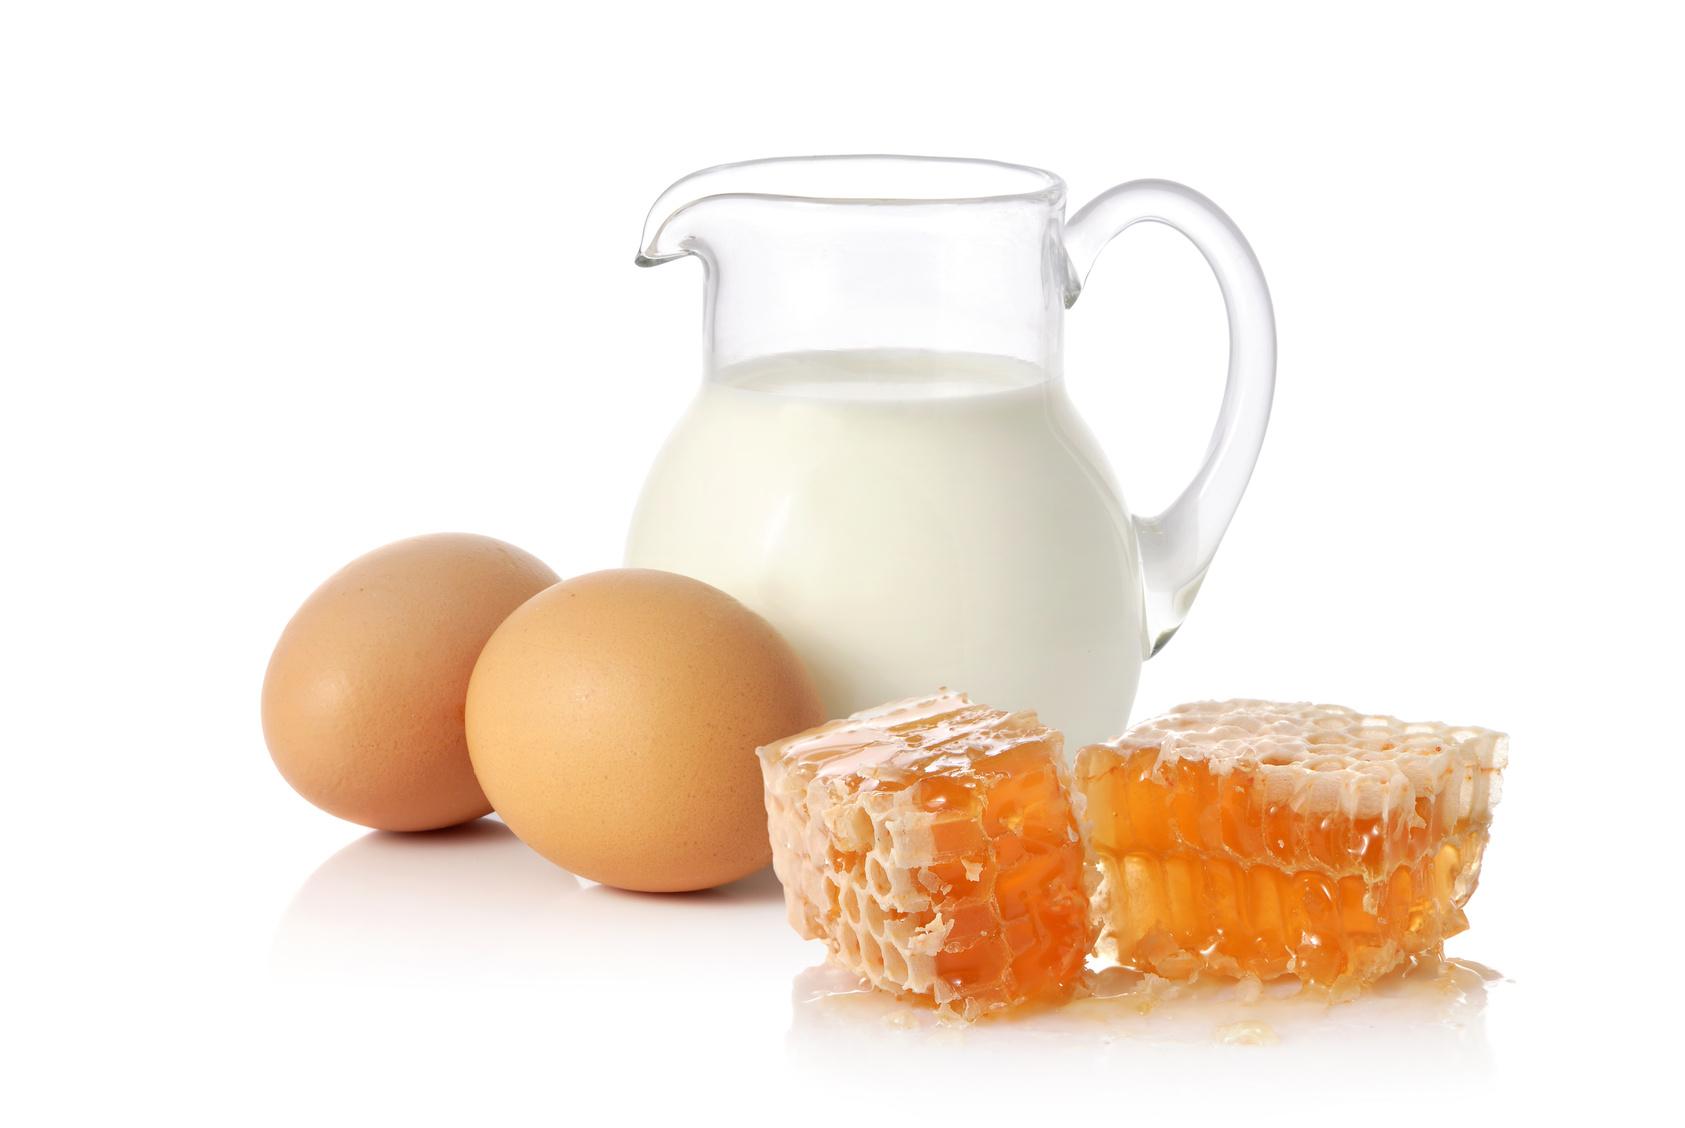 Uova, latte e miele